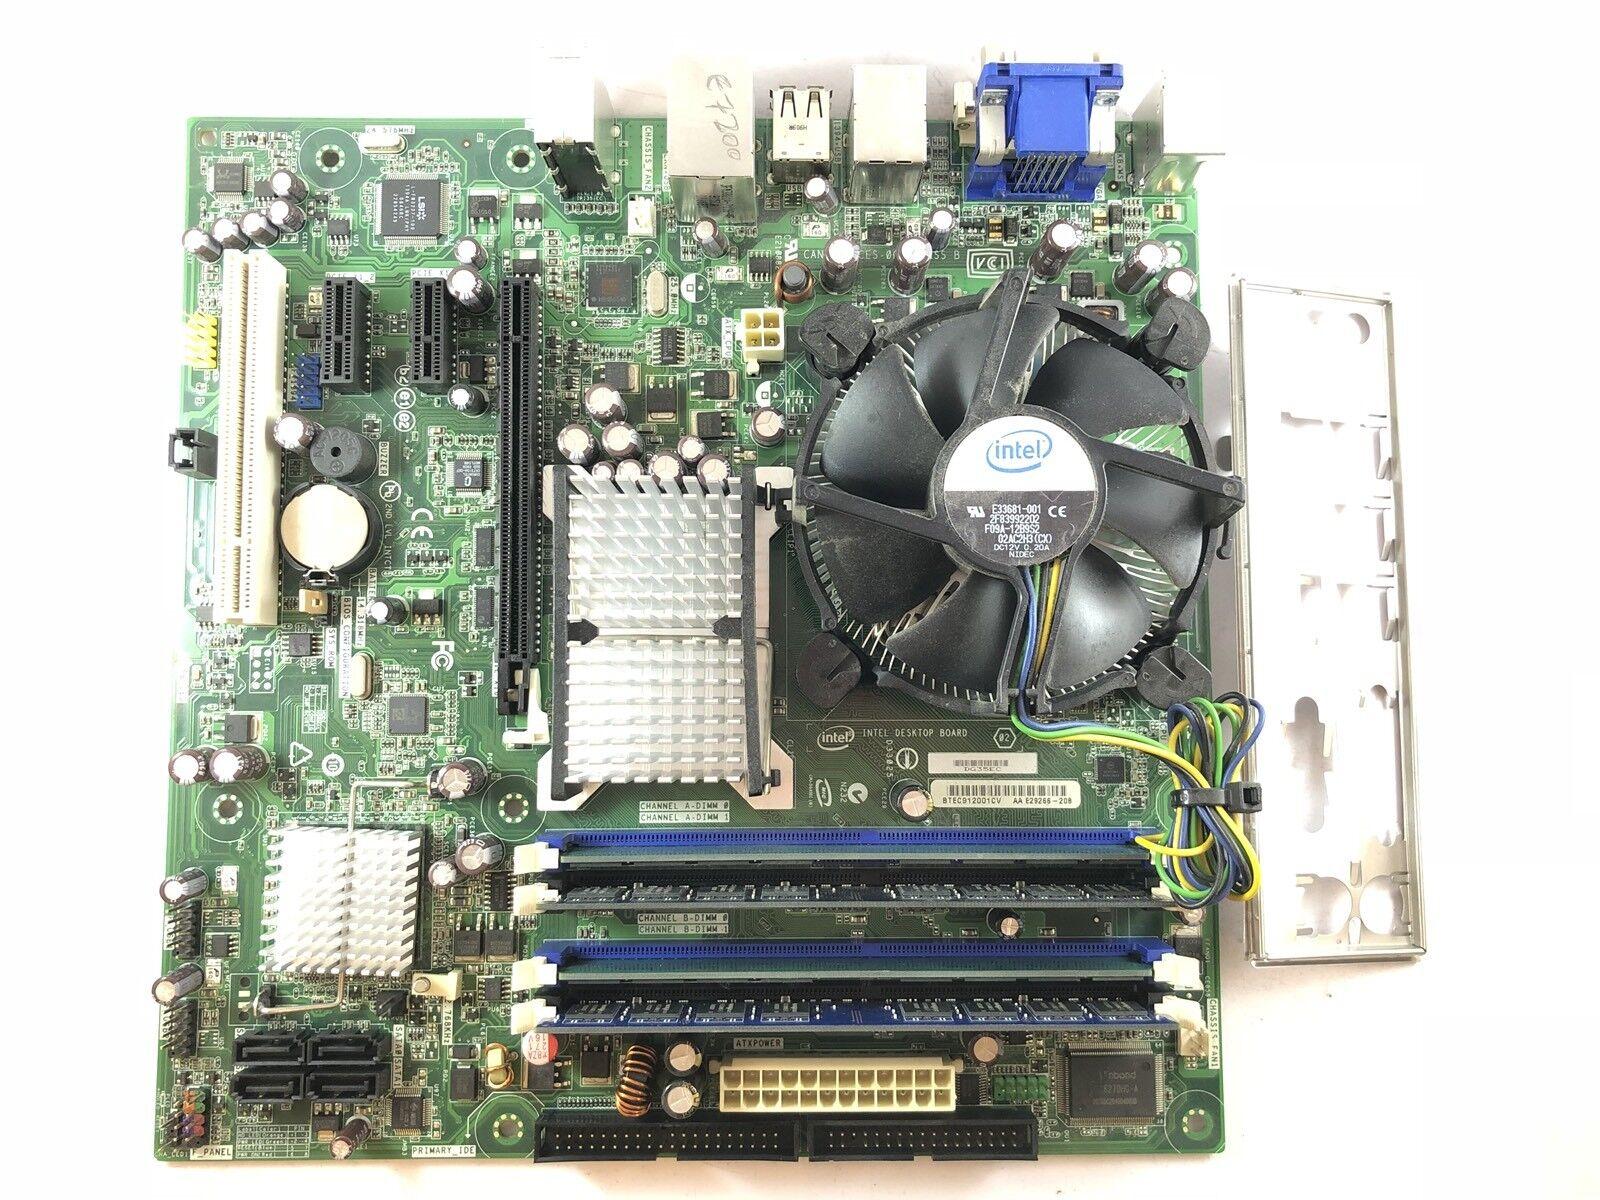 Intel DG31PR D97573-301 Socket 775 Motherboard With Dual Core E2200 2.20 GHz Cpu